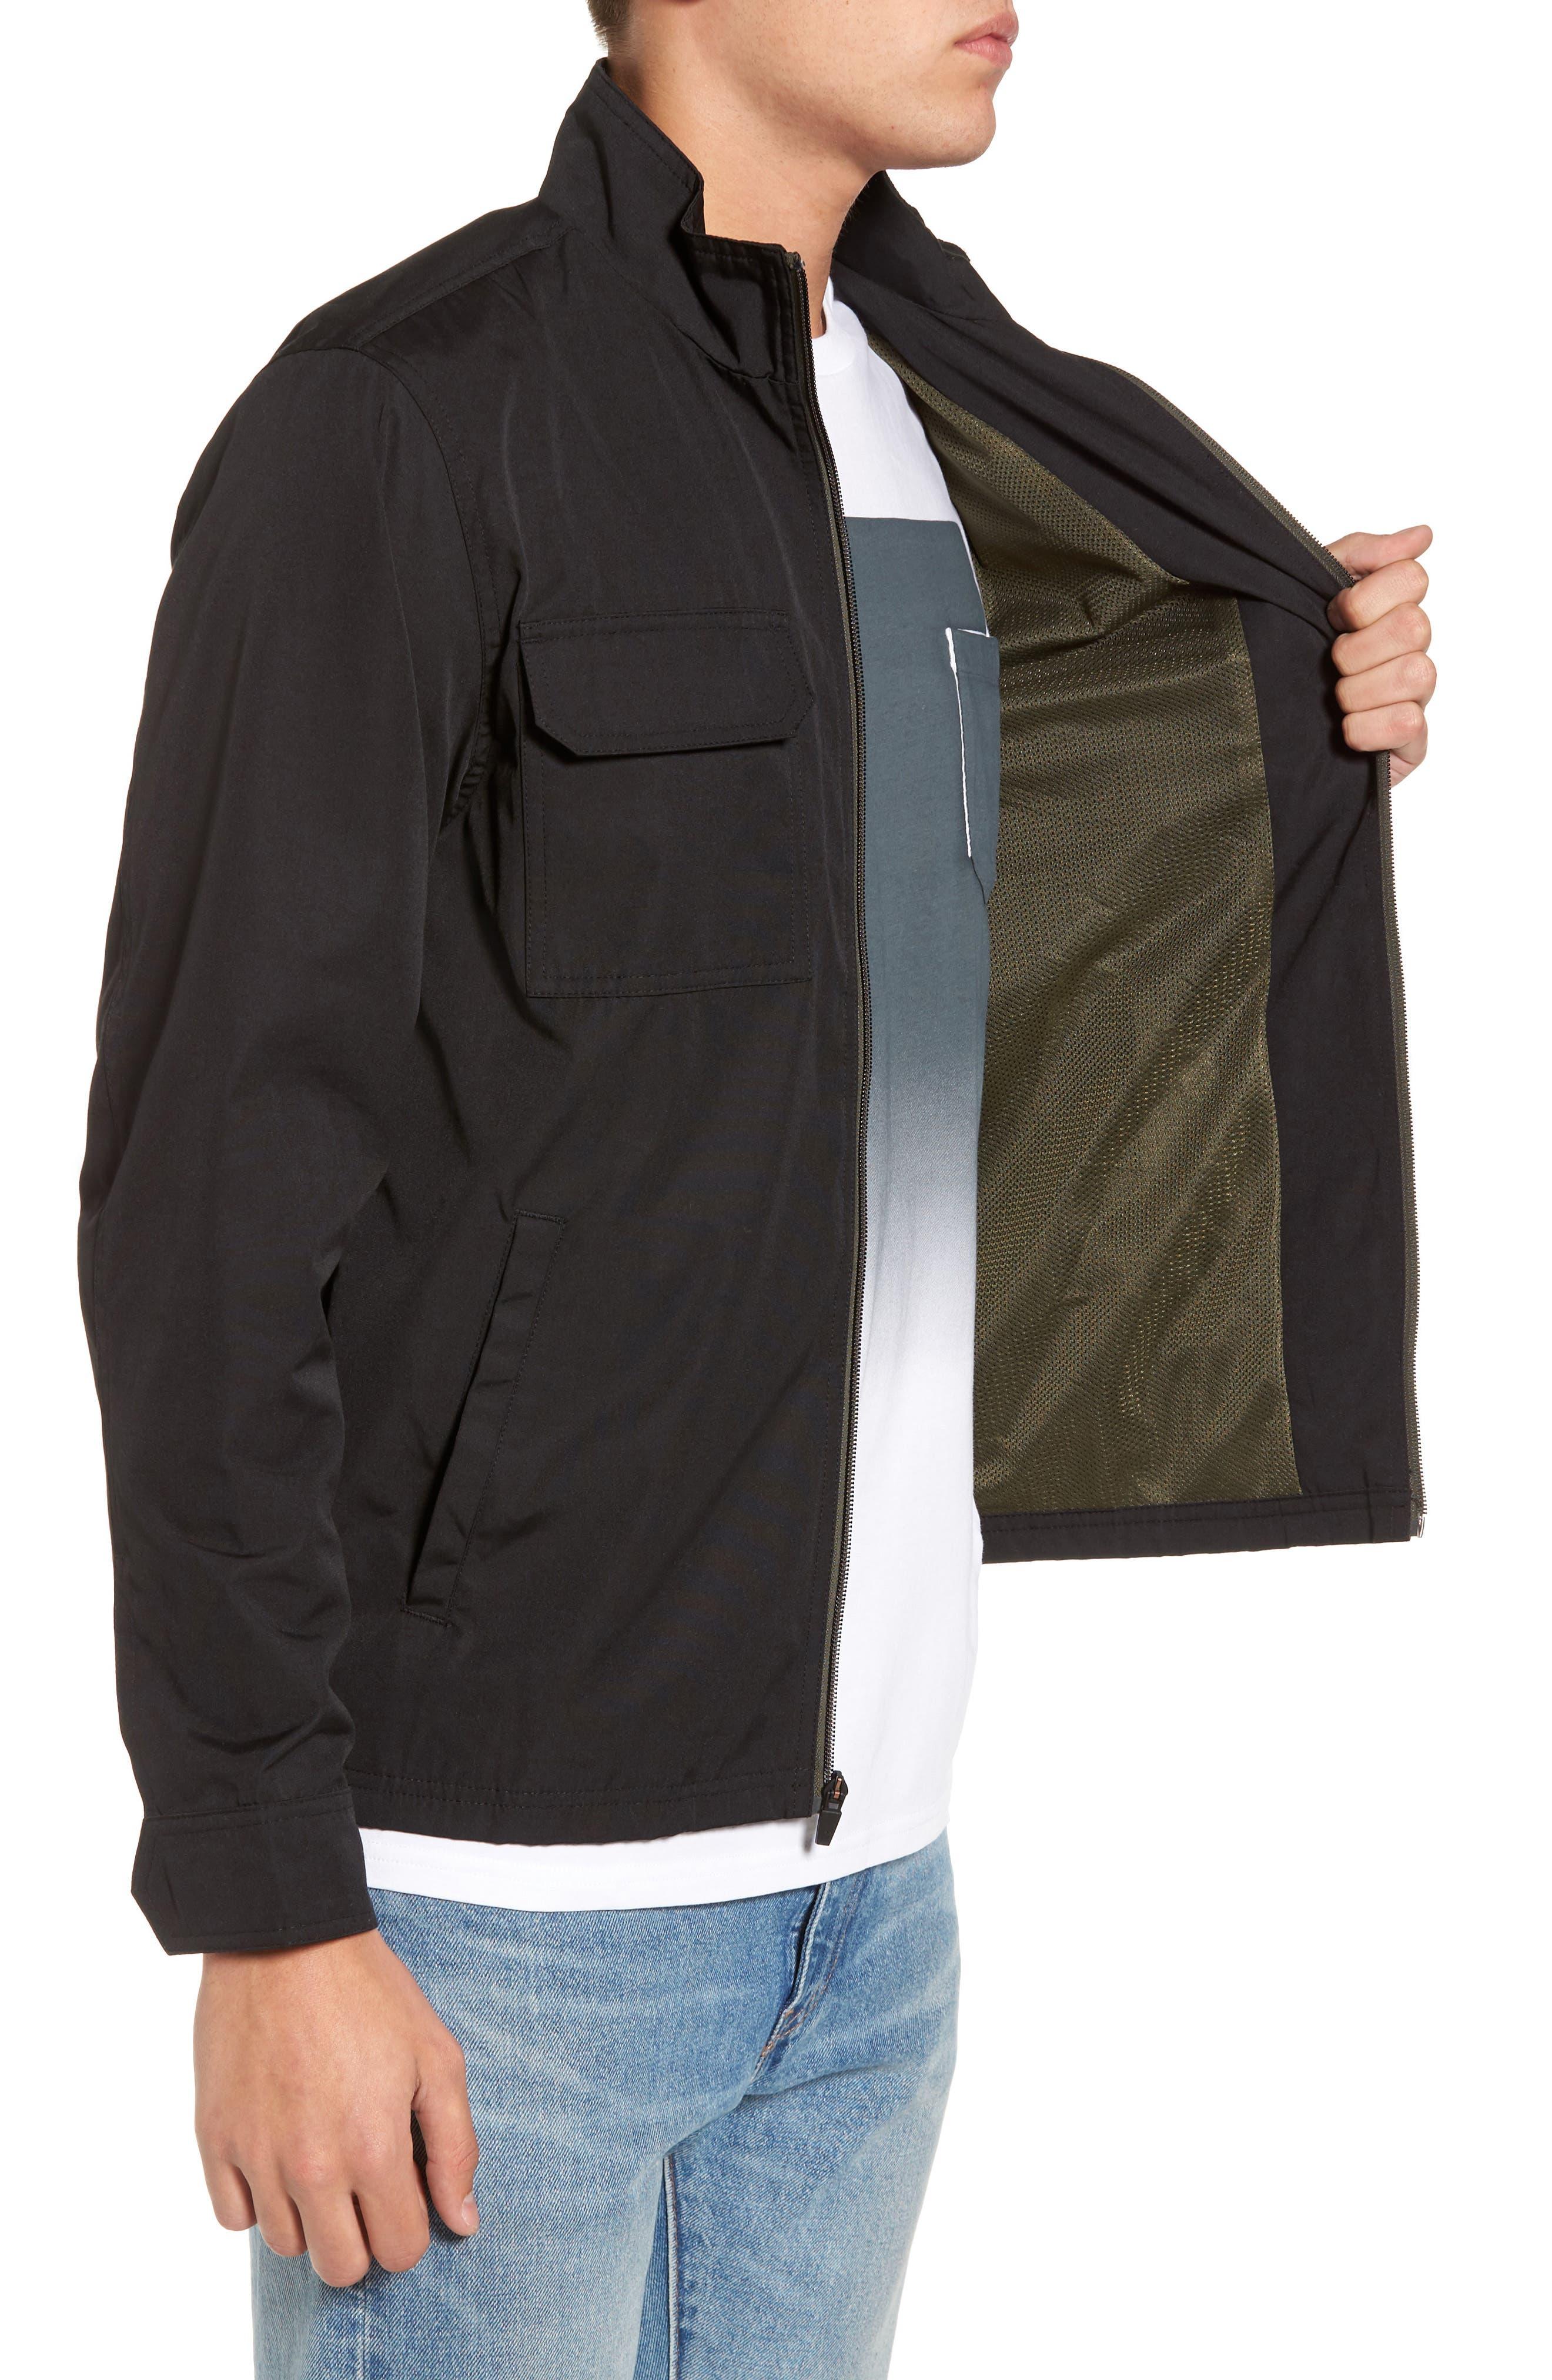 Staple Jacket,                             Alternate thumbnail 3, color,                             002